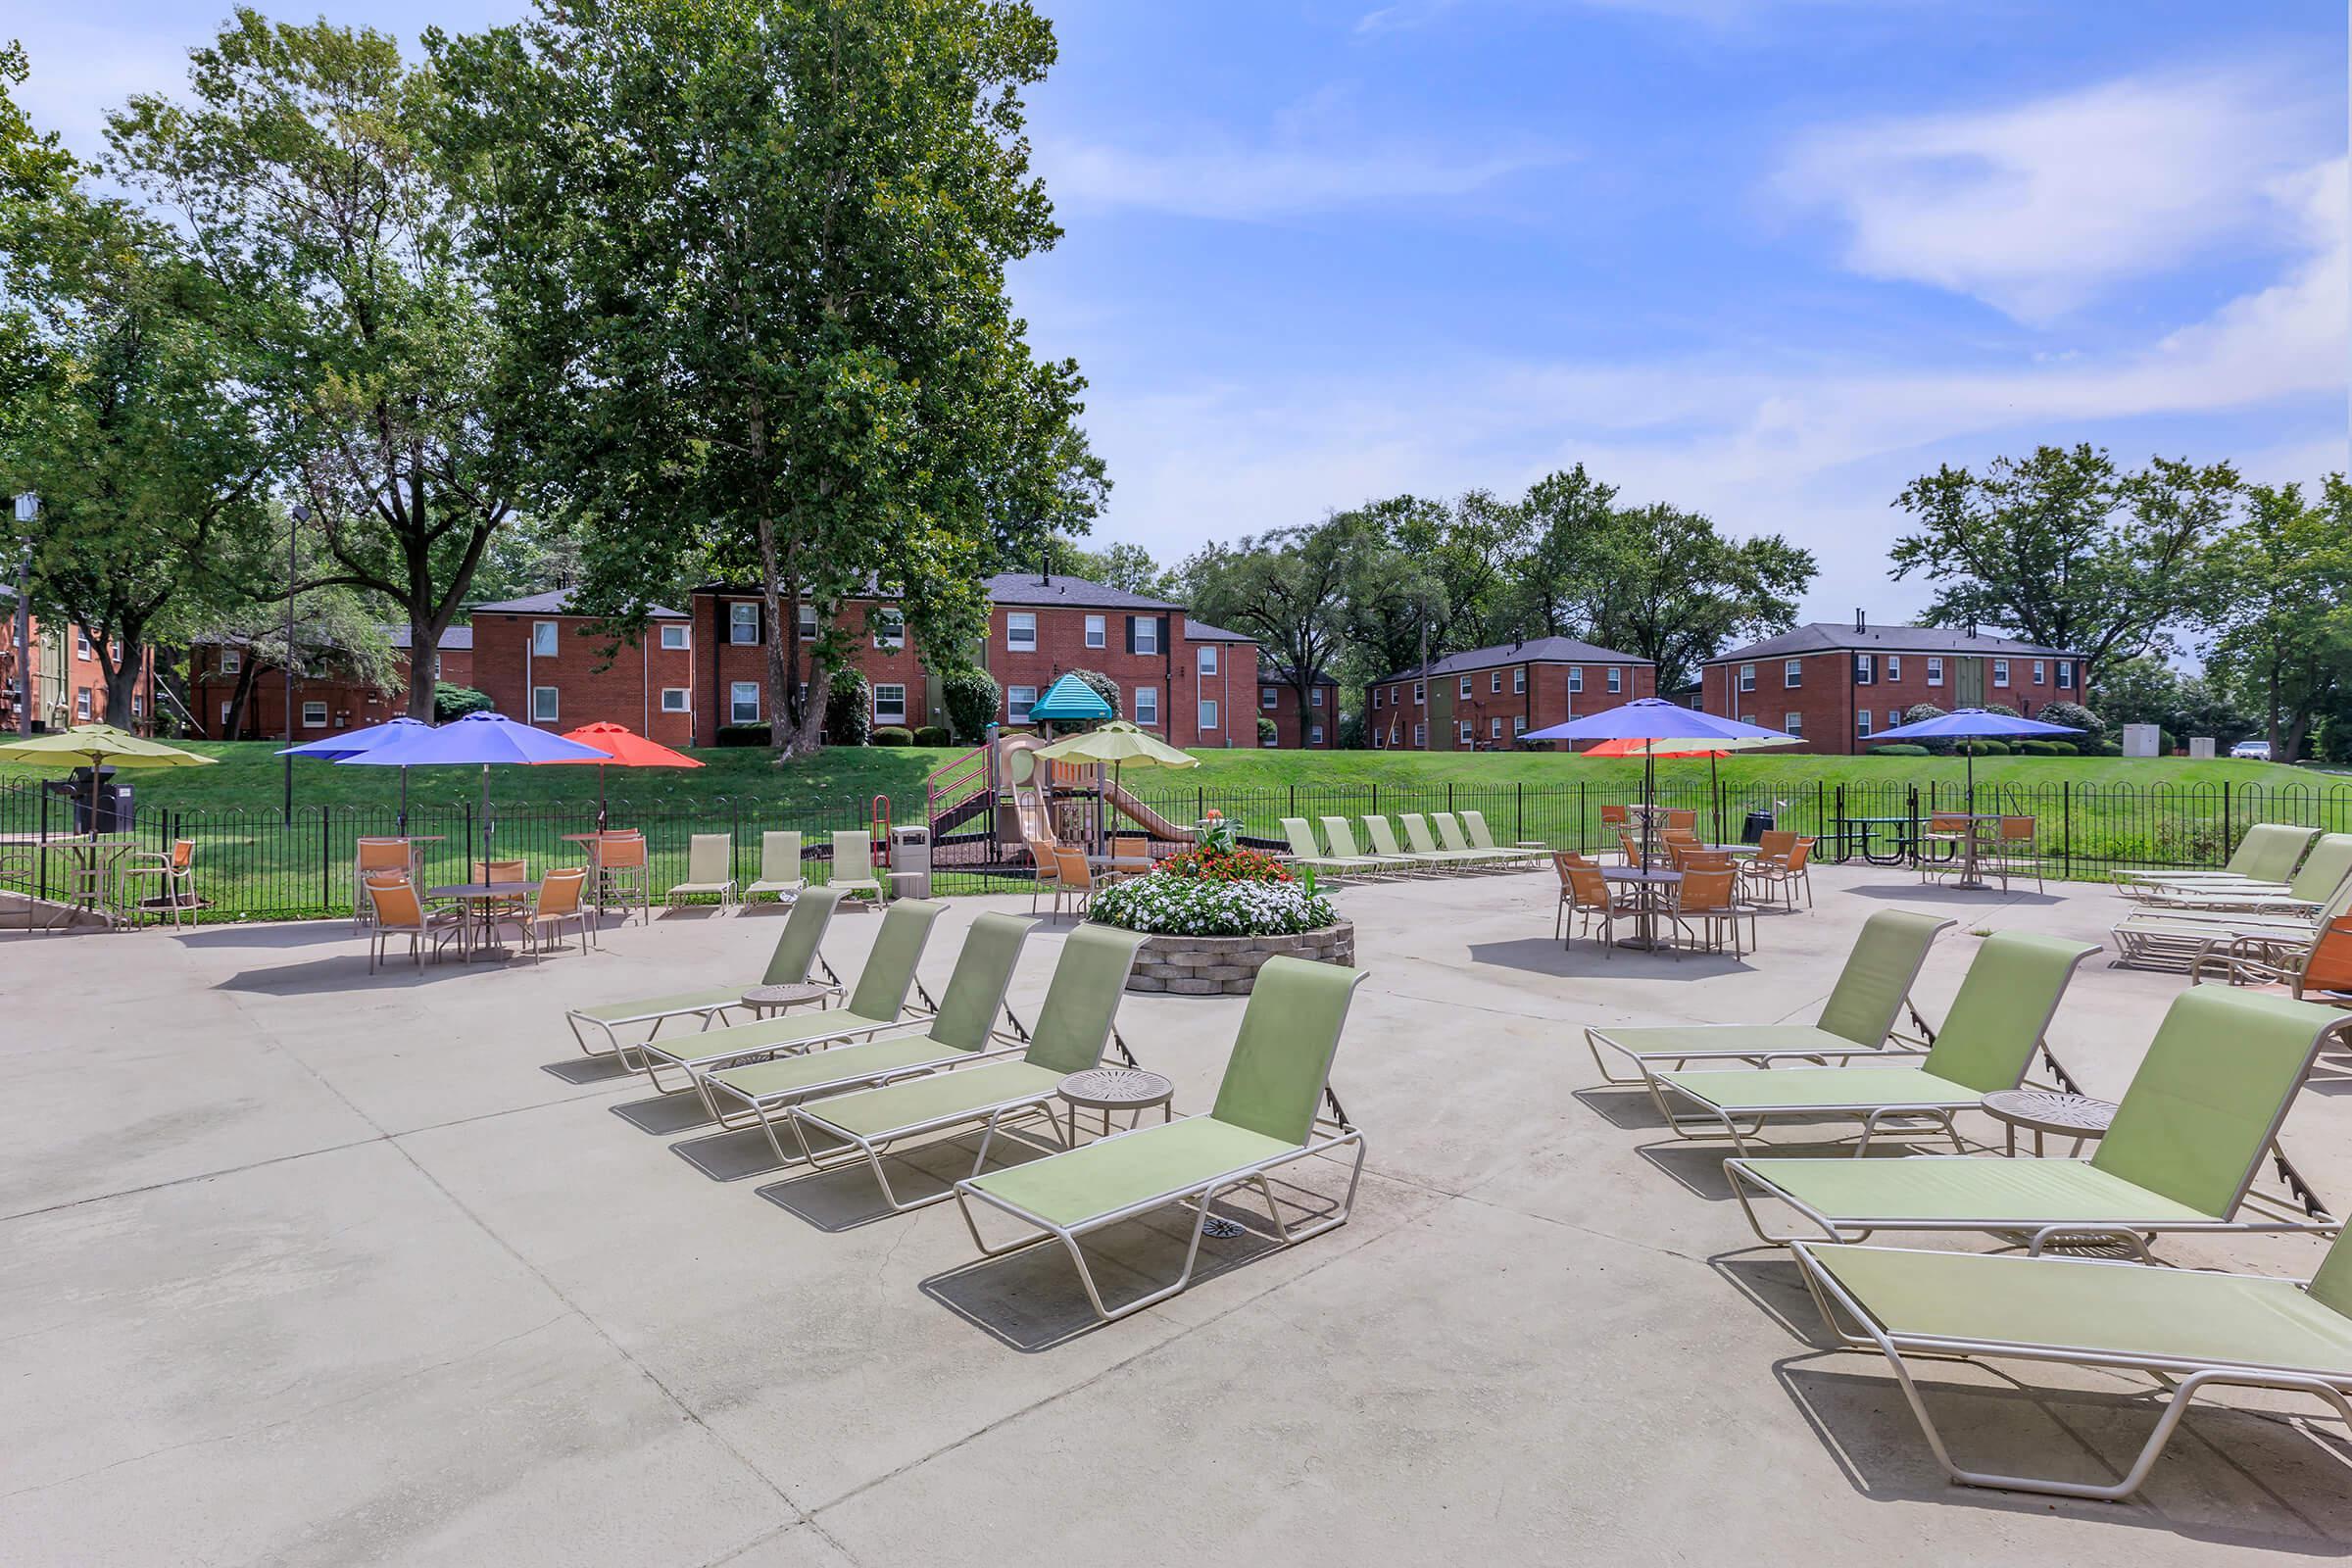 Soak Up The Missouri Sun at The Pool